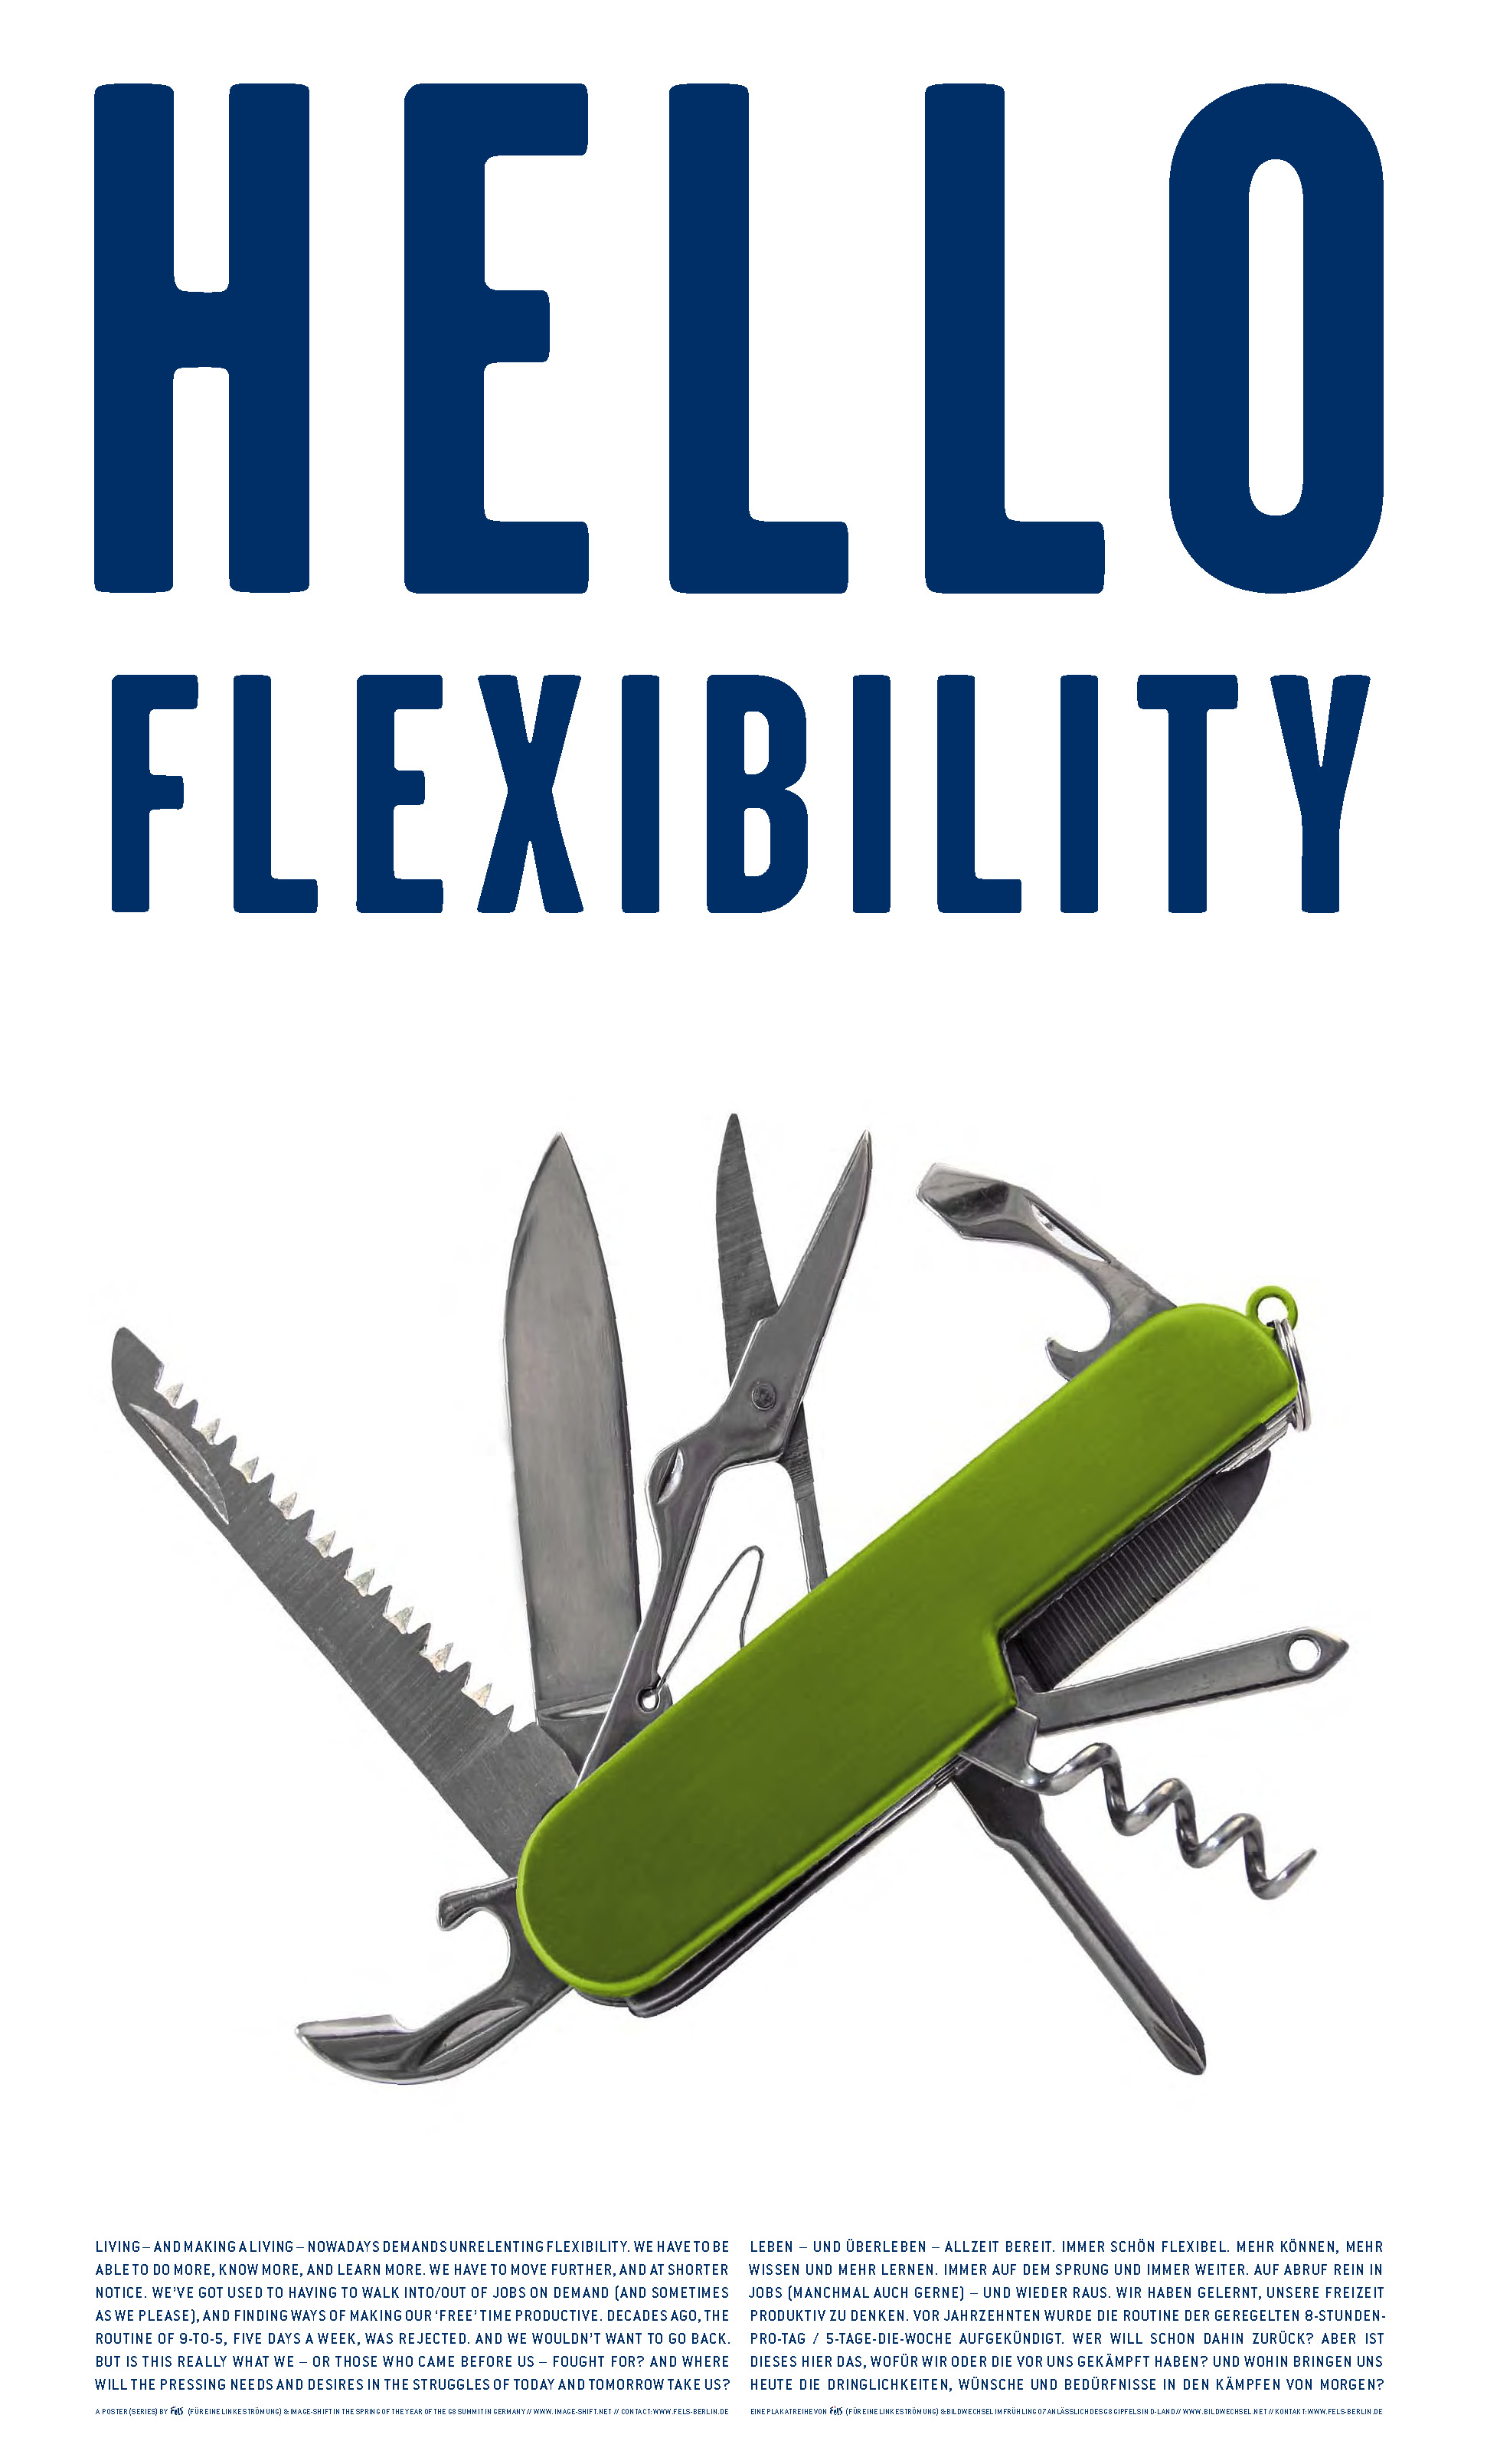 hello_fexibility.jpg